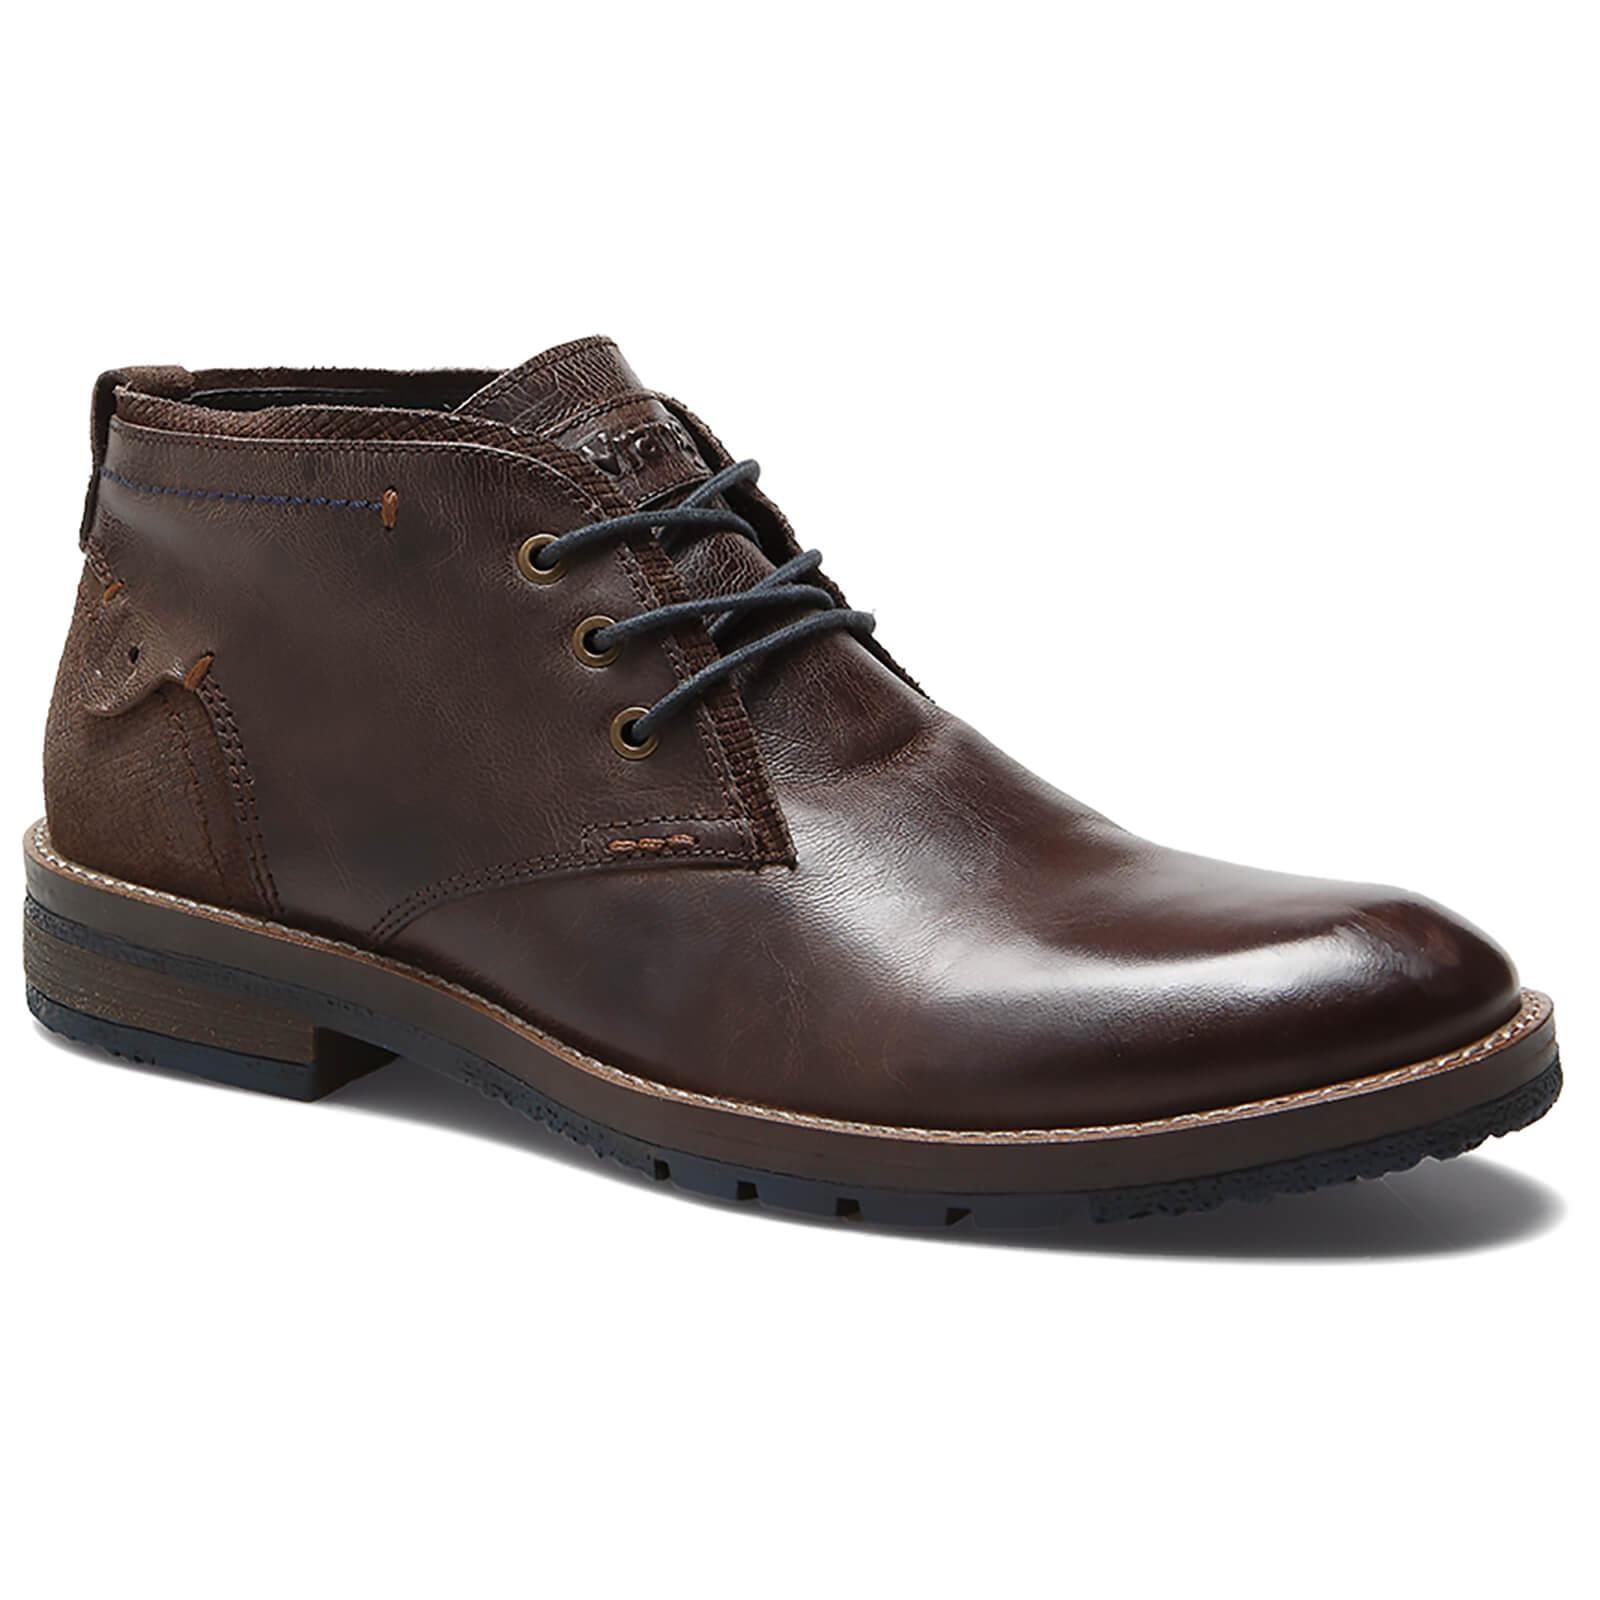 73a9996d5dc Wrangler Men's Boogie Leather Desert Boots - Dark Brown